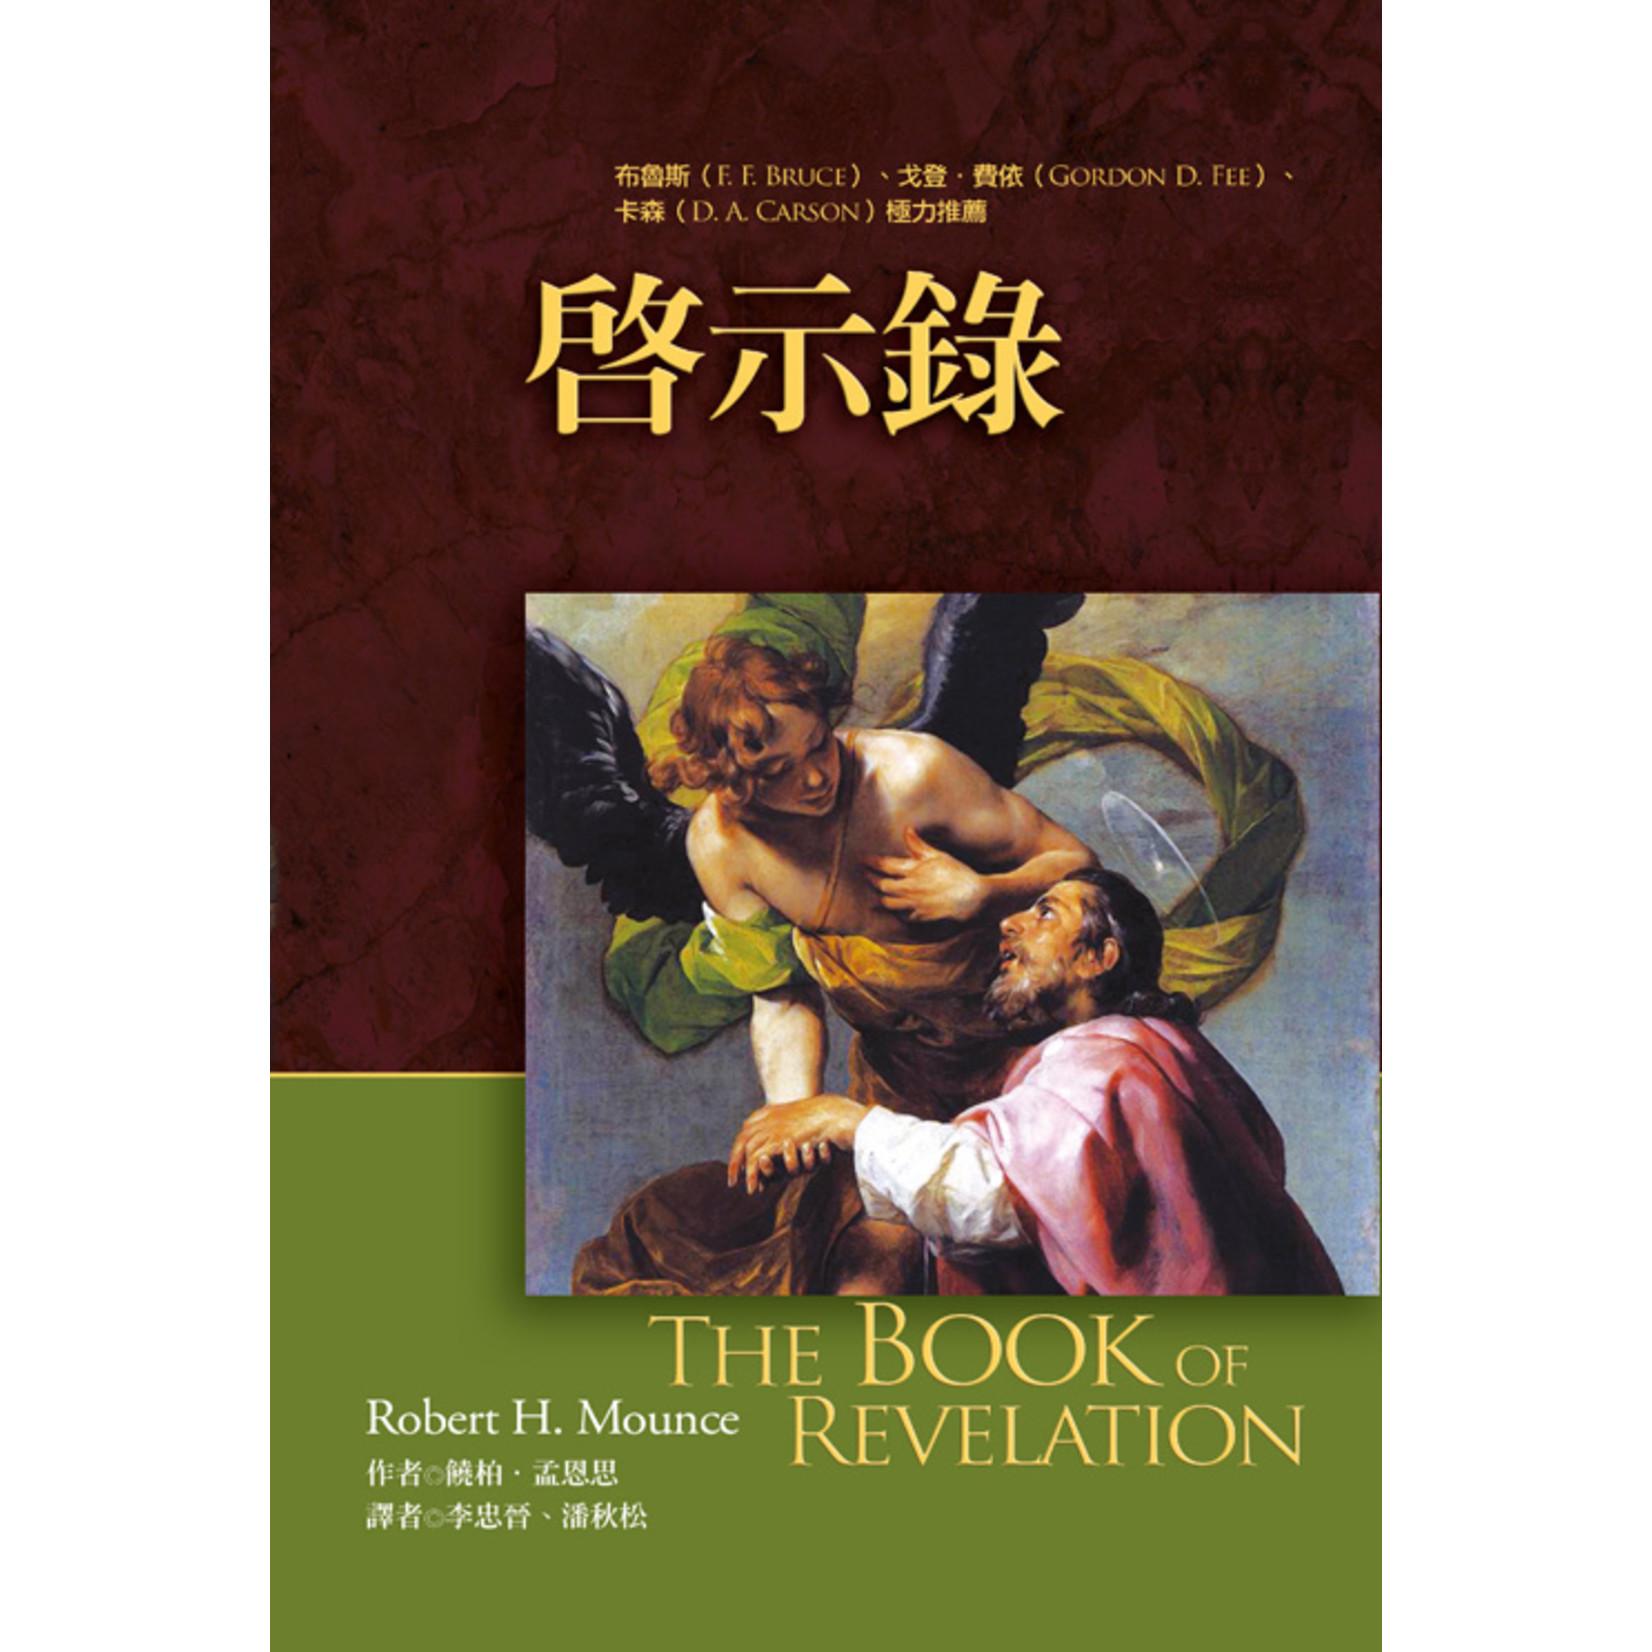 美國麥種傳道會 AKOWCM 麥種聖經註釋:啟示錄 The Book of Revelation (NICNT)